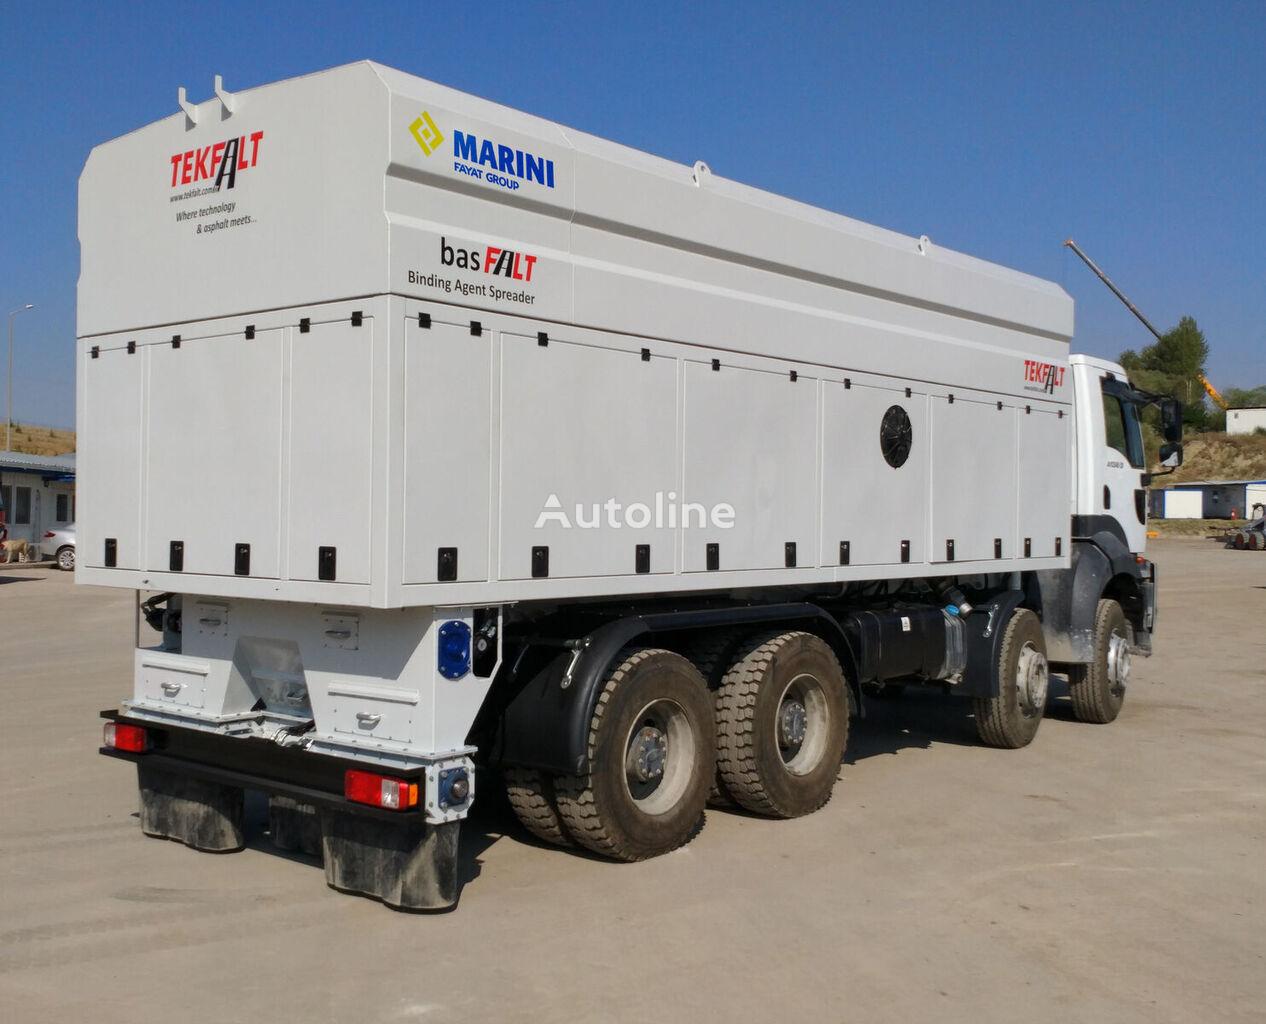 camion militaire TEKFALT basFALT Binding Agent Spreader neuf